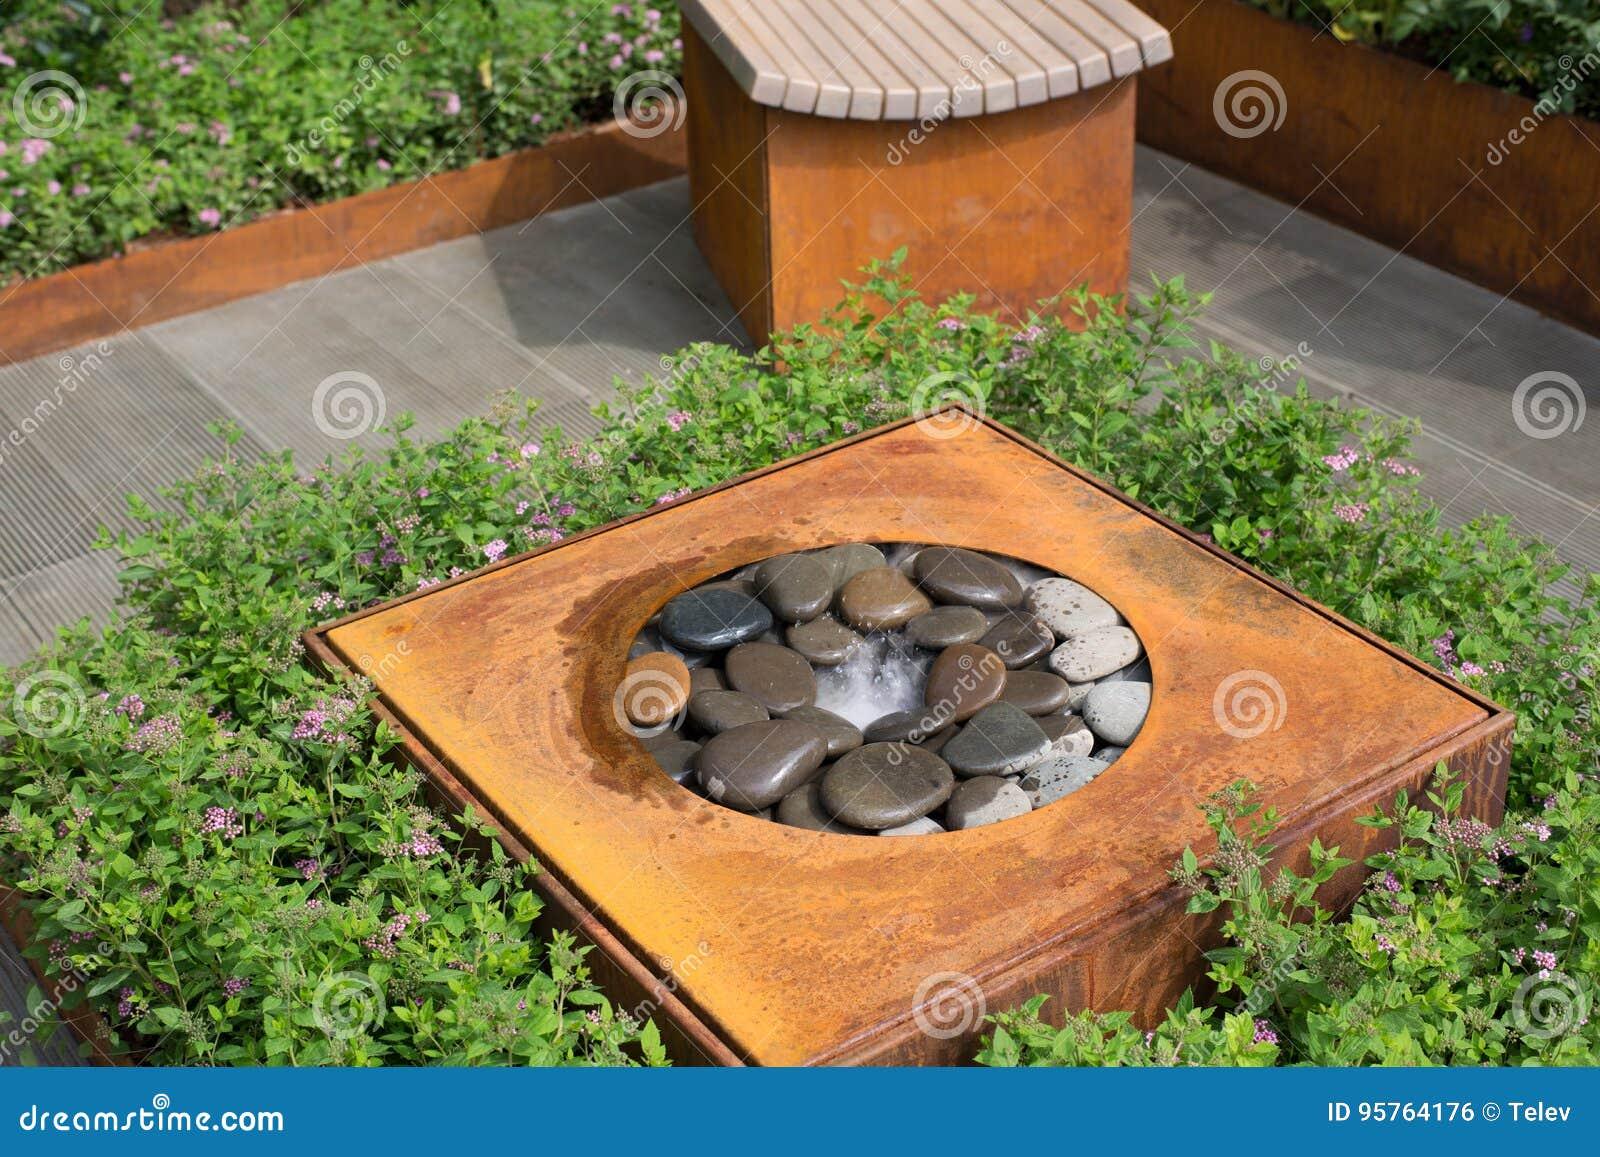 High Tech In Garden Design